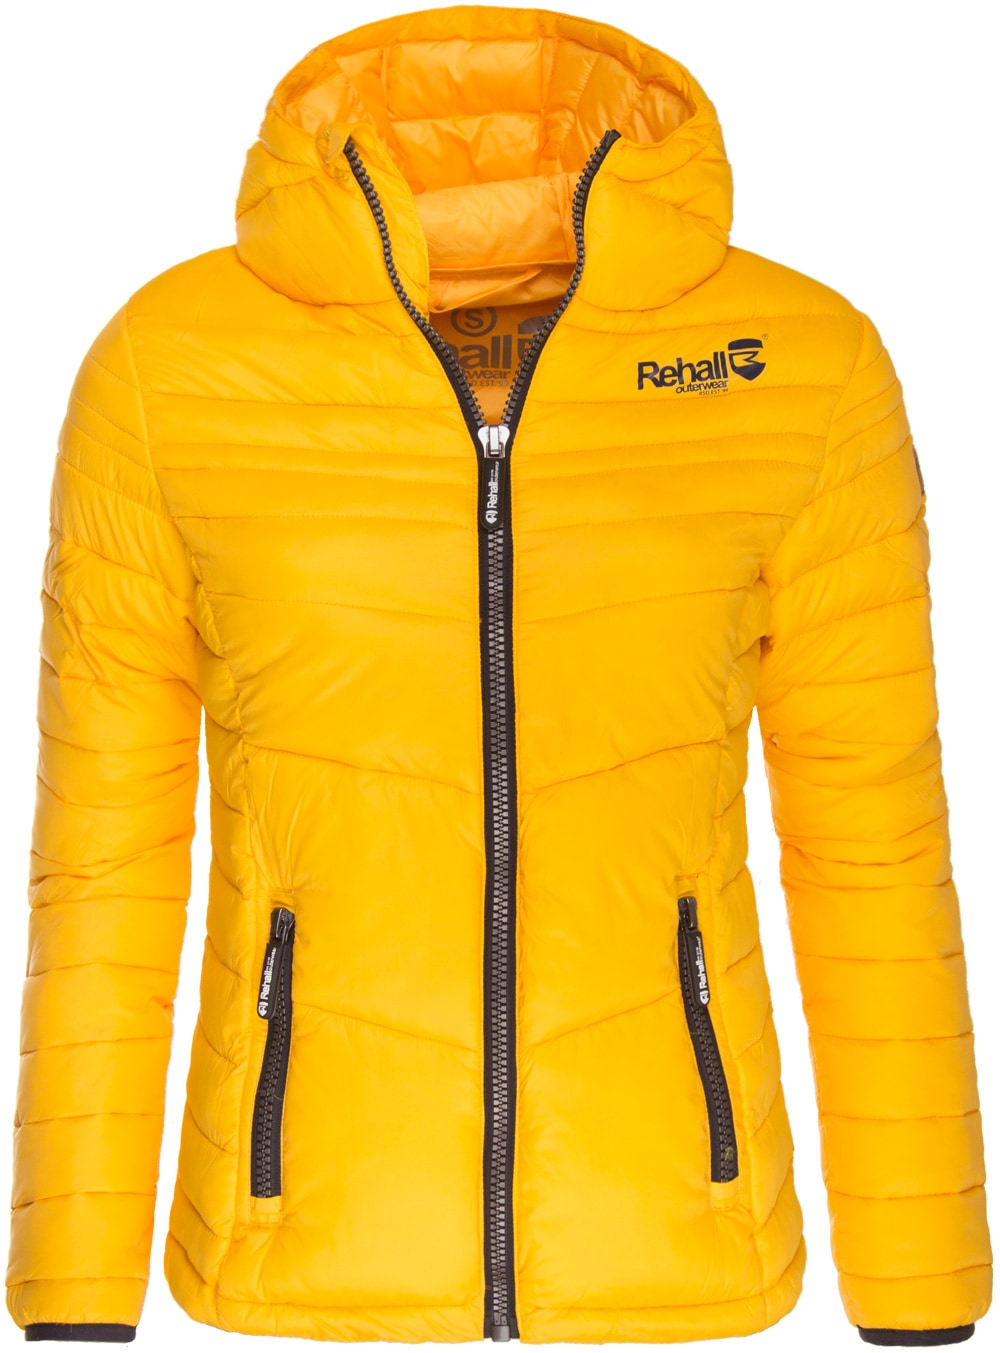 Zimní bunda dámska Rehall SALLYAN-R